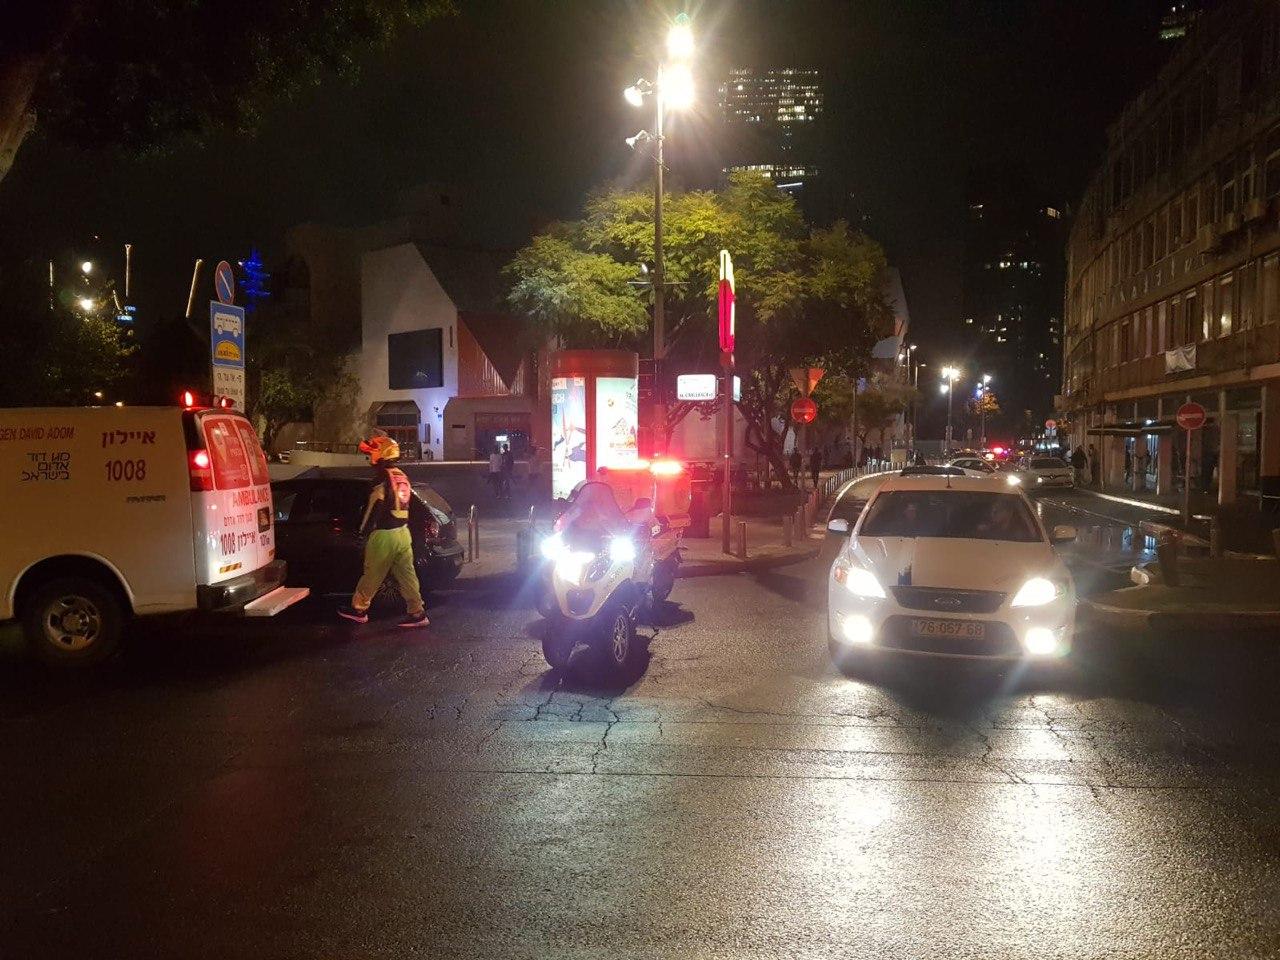 "Photo of אלימות קשה בבילוי בתל אביב: שני צעירים כבני 20 נפצעו בינוני בקטטה ופונו לביה""ח"